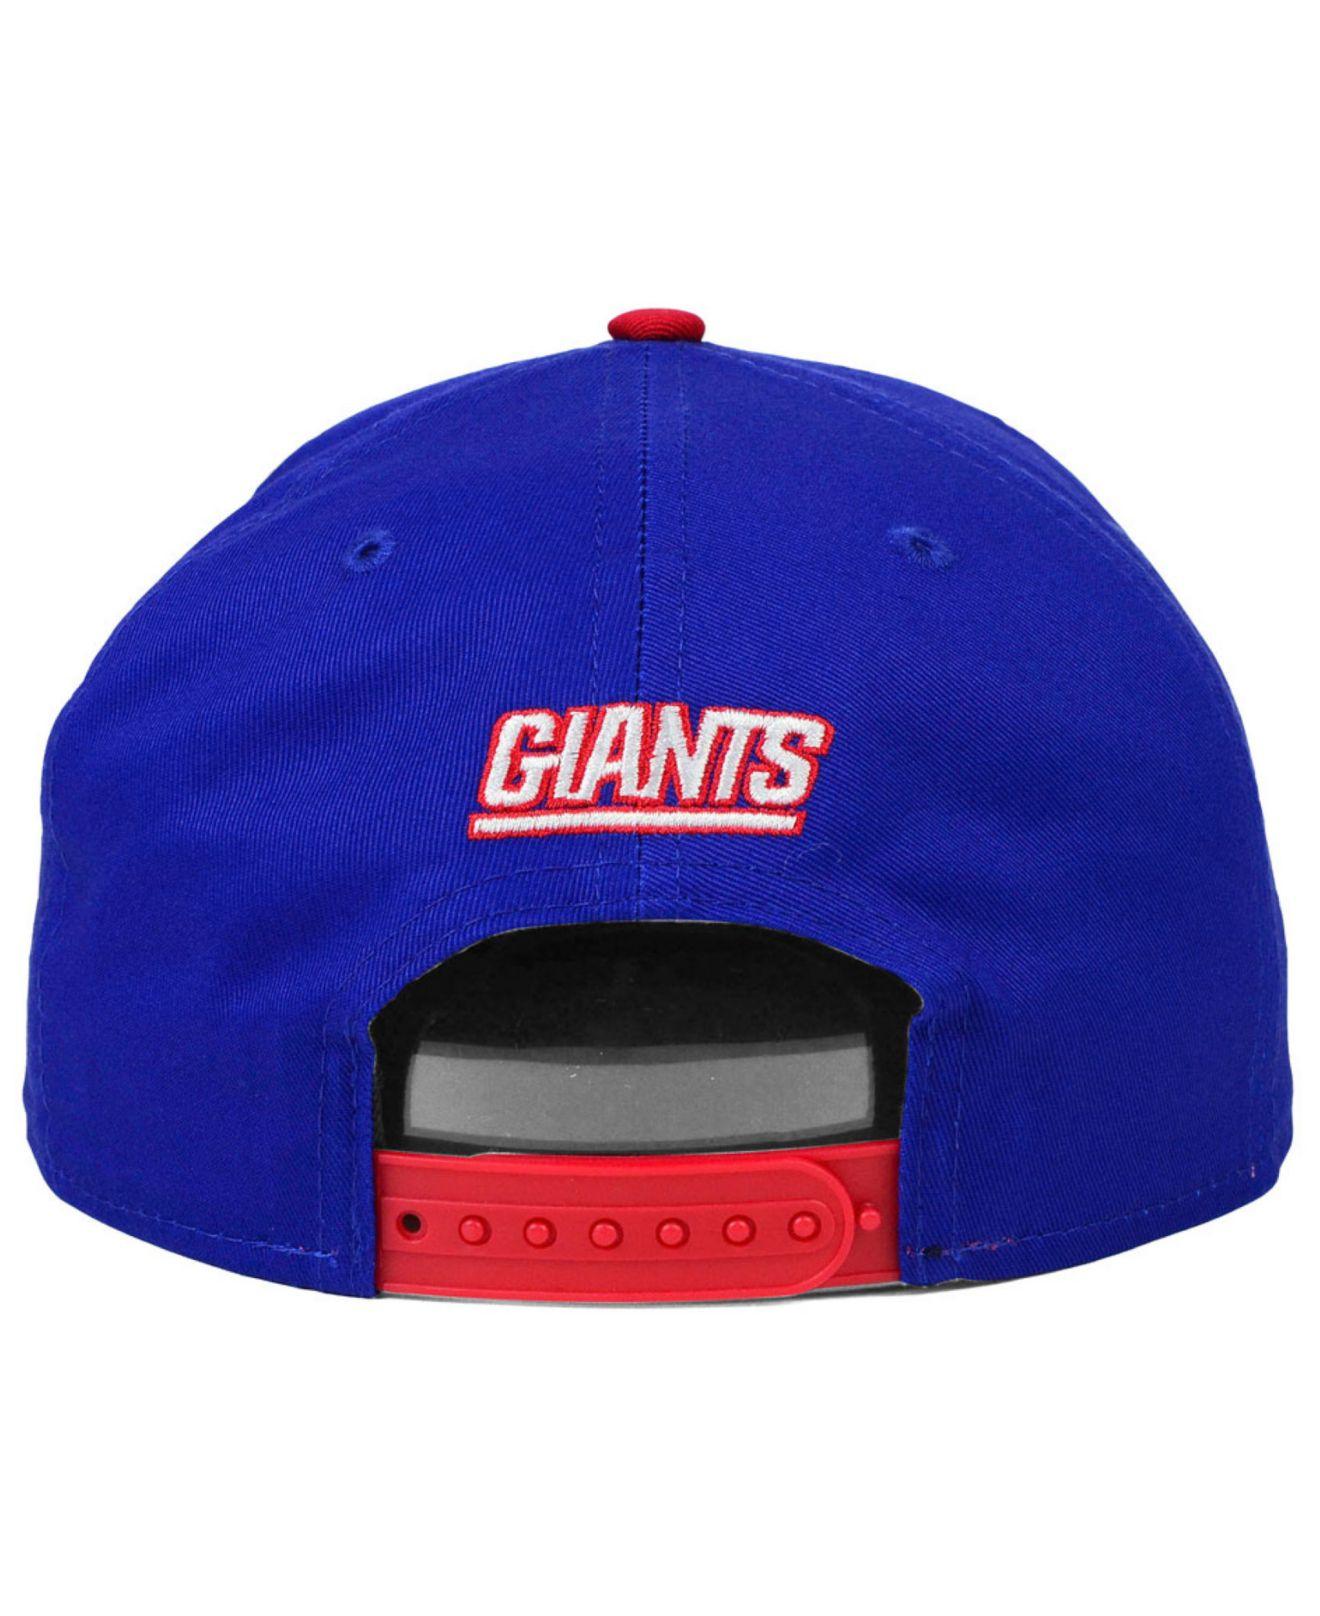 6babd61c157 Lyst - KTZ New York Giants 2015 Nfl Draft 9fifty Snapback Cap in ...